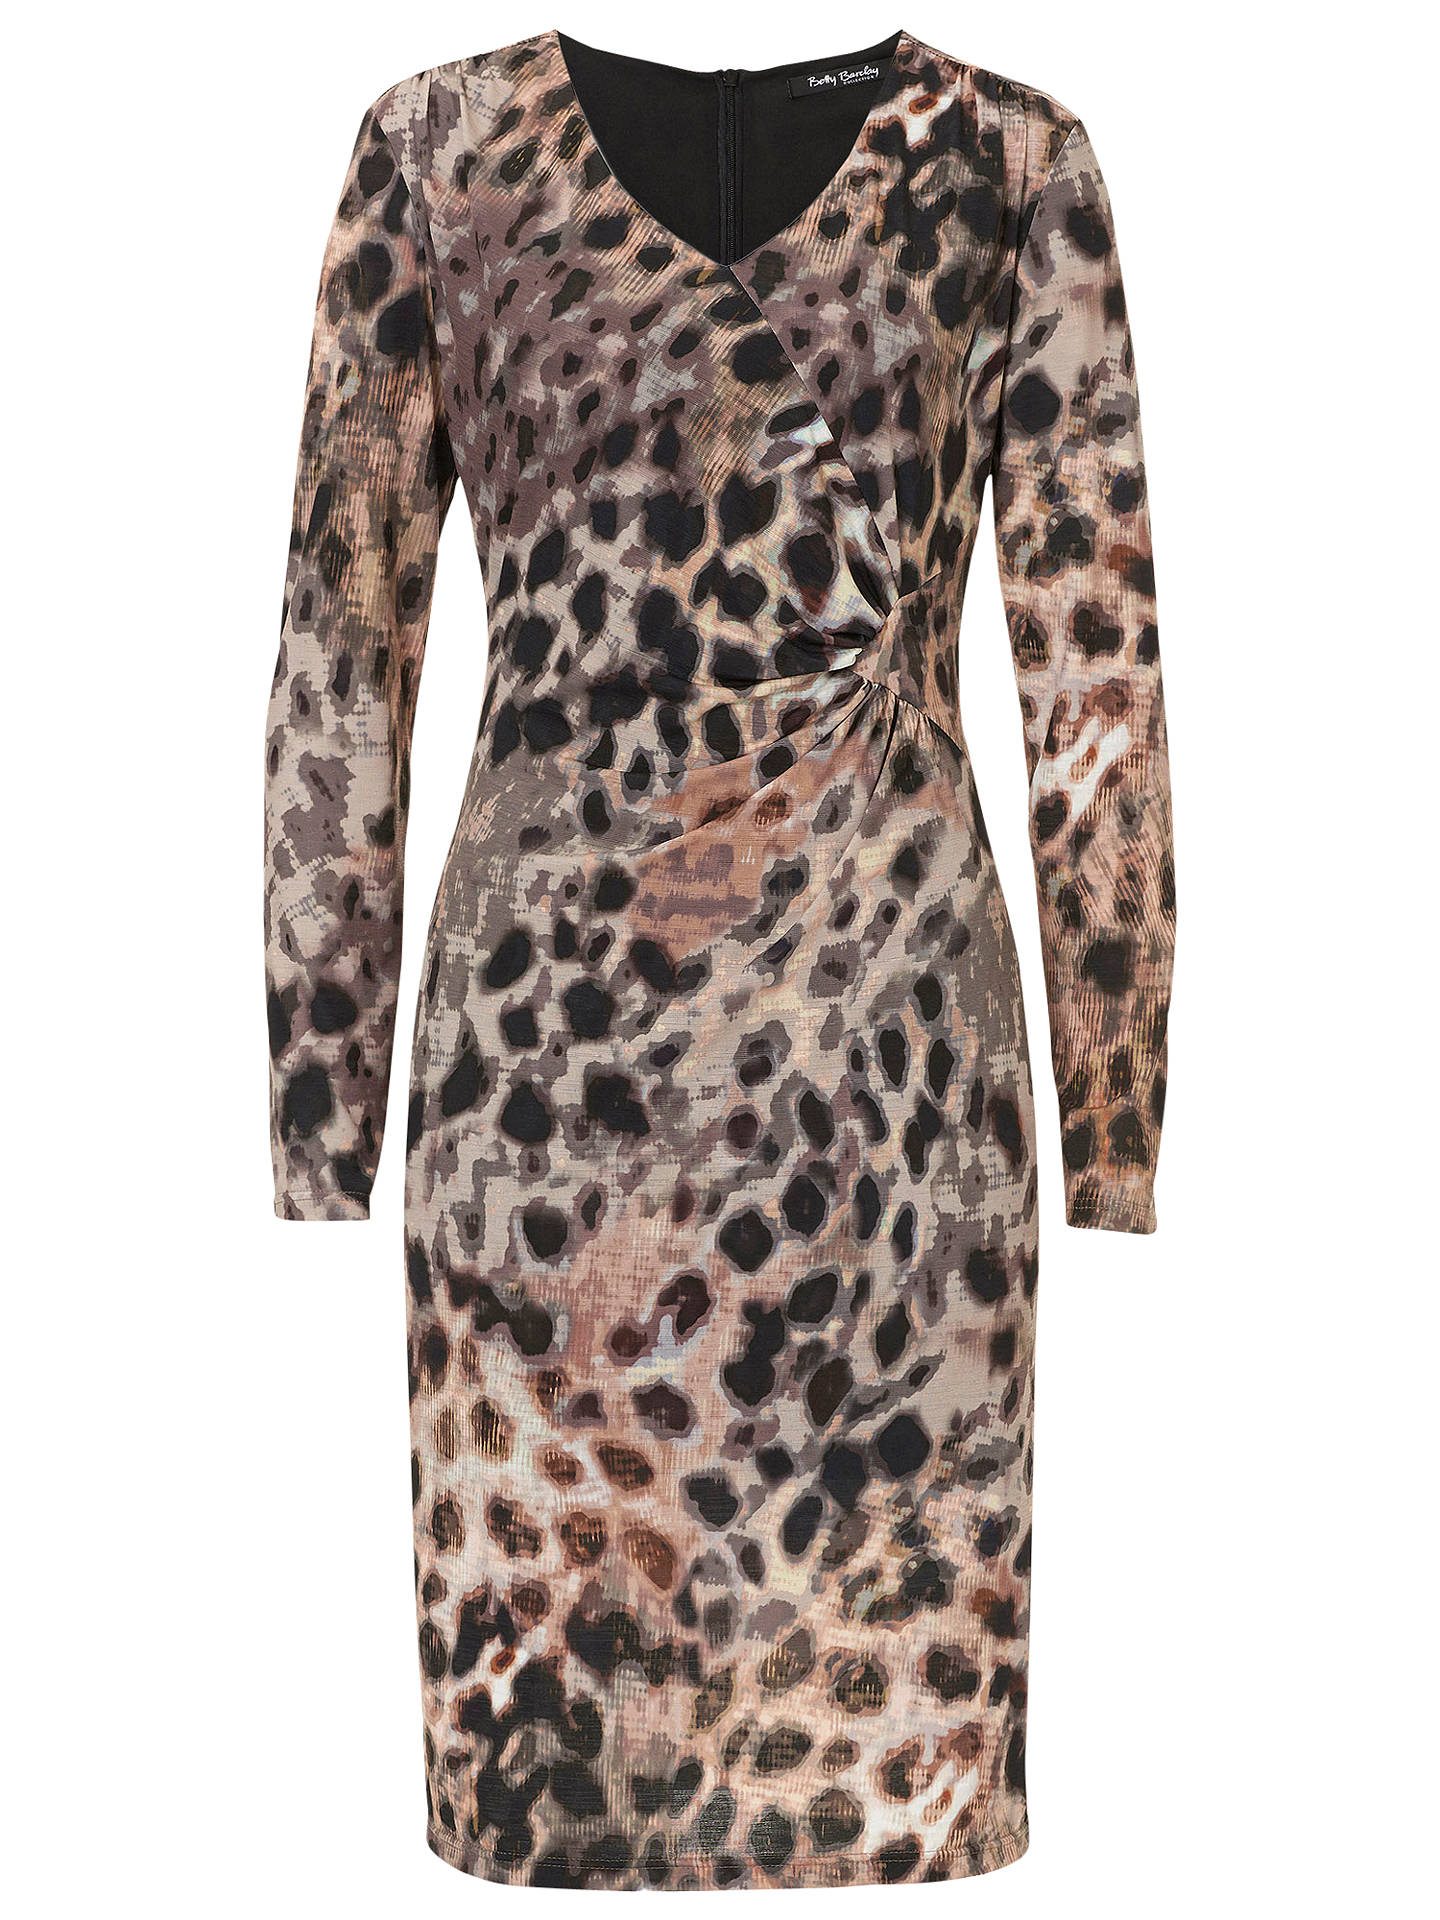 Betty Barclay Animal Print V Neck Dress, Taupe/Apricot at John Lewis ...